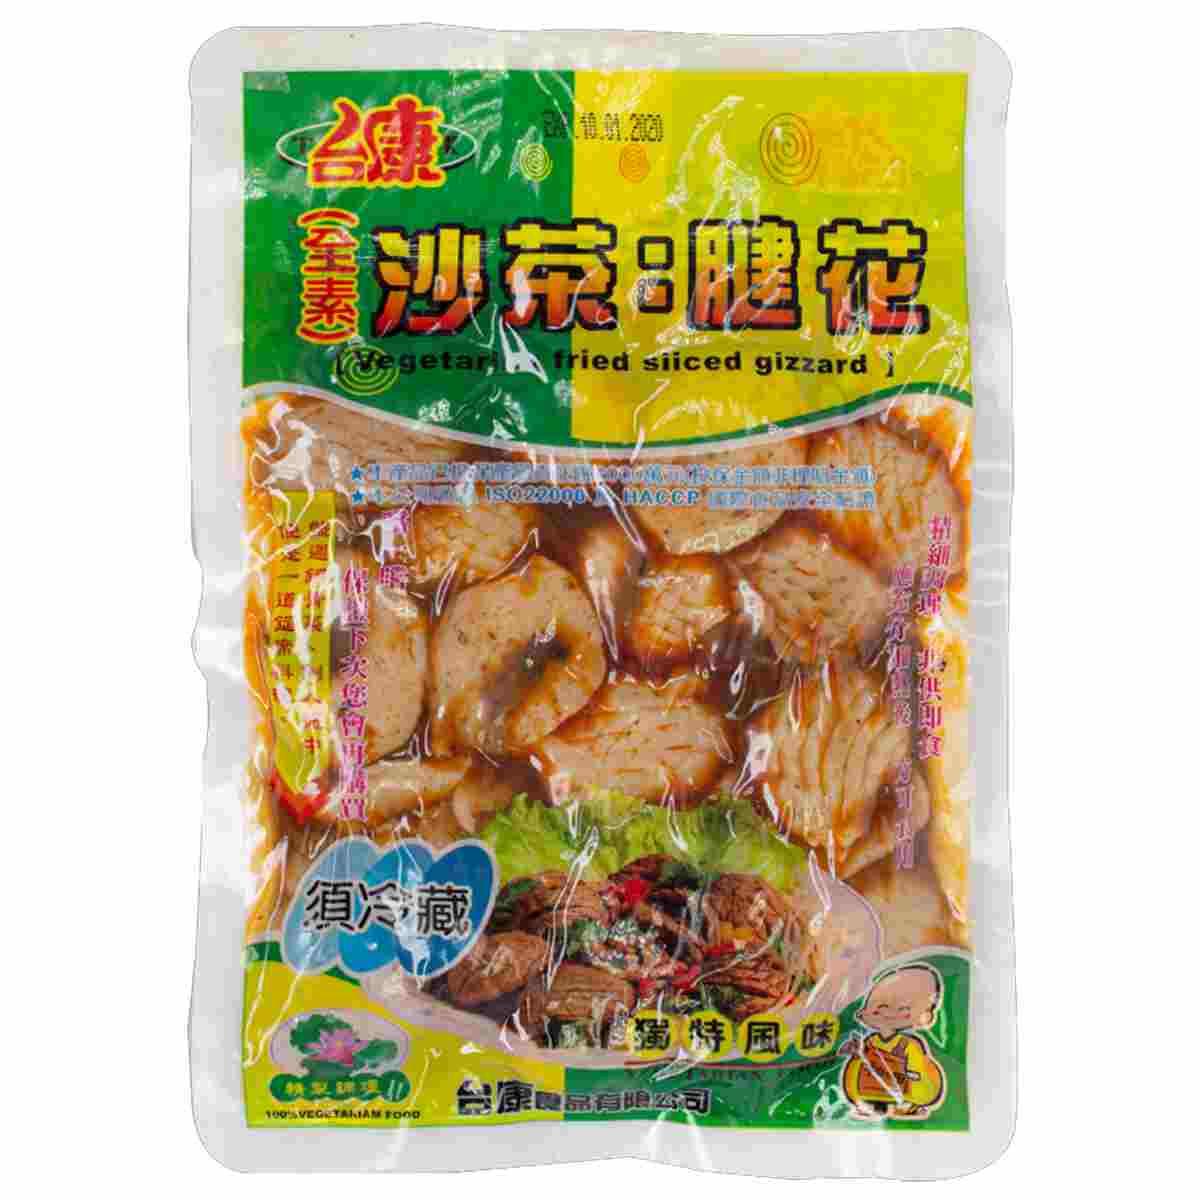 Image Vegetarian Fried Sliced Gizzard 大成-沙茶腱花 260grams